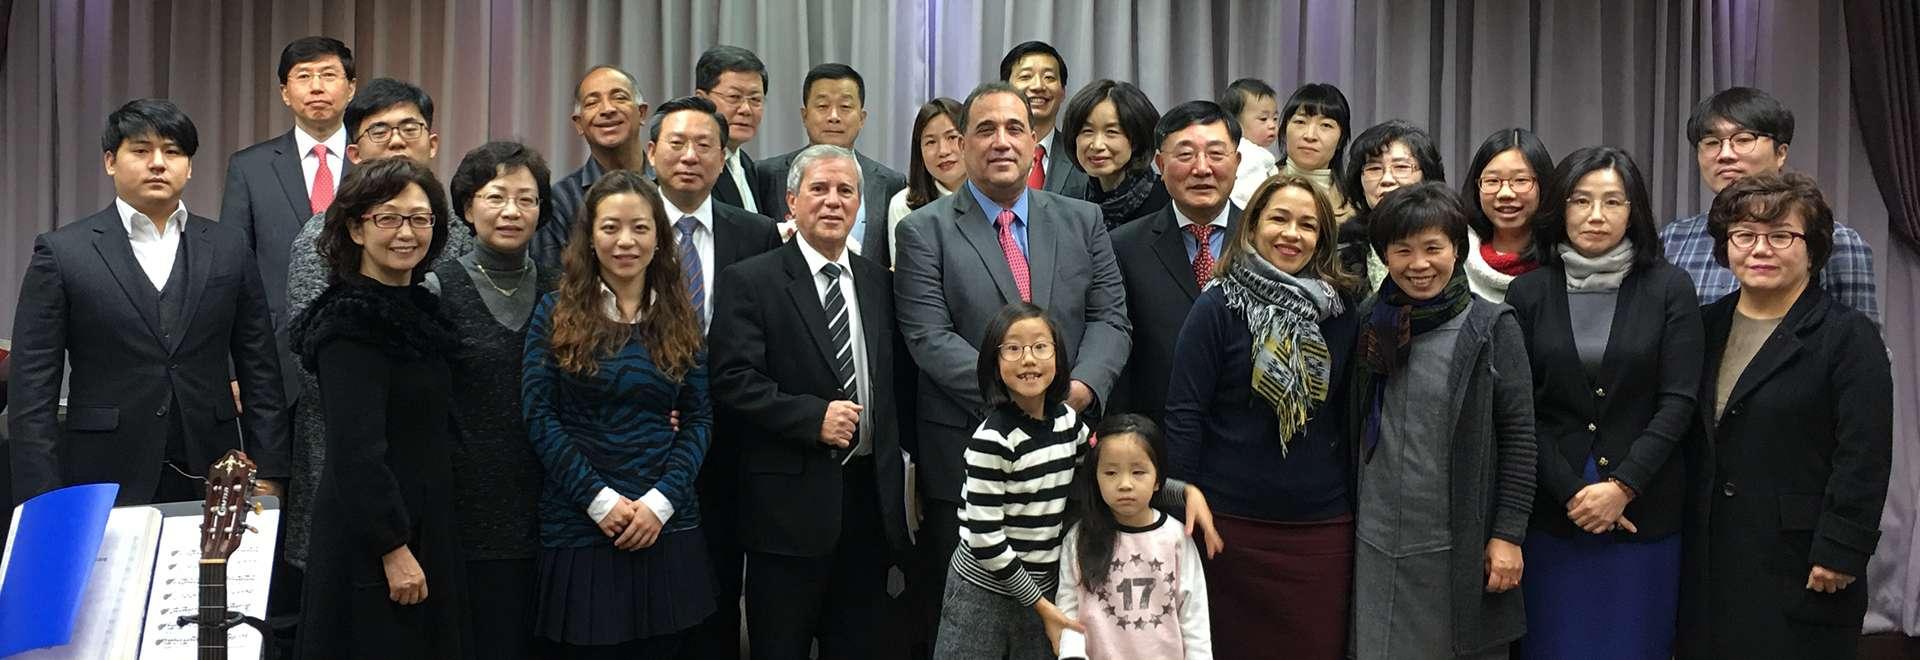 Igreja Cristã Maranata realiza seminário na Coreia do Sul